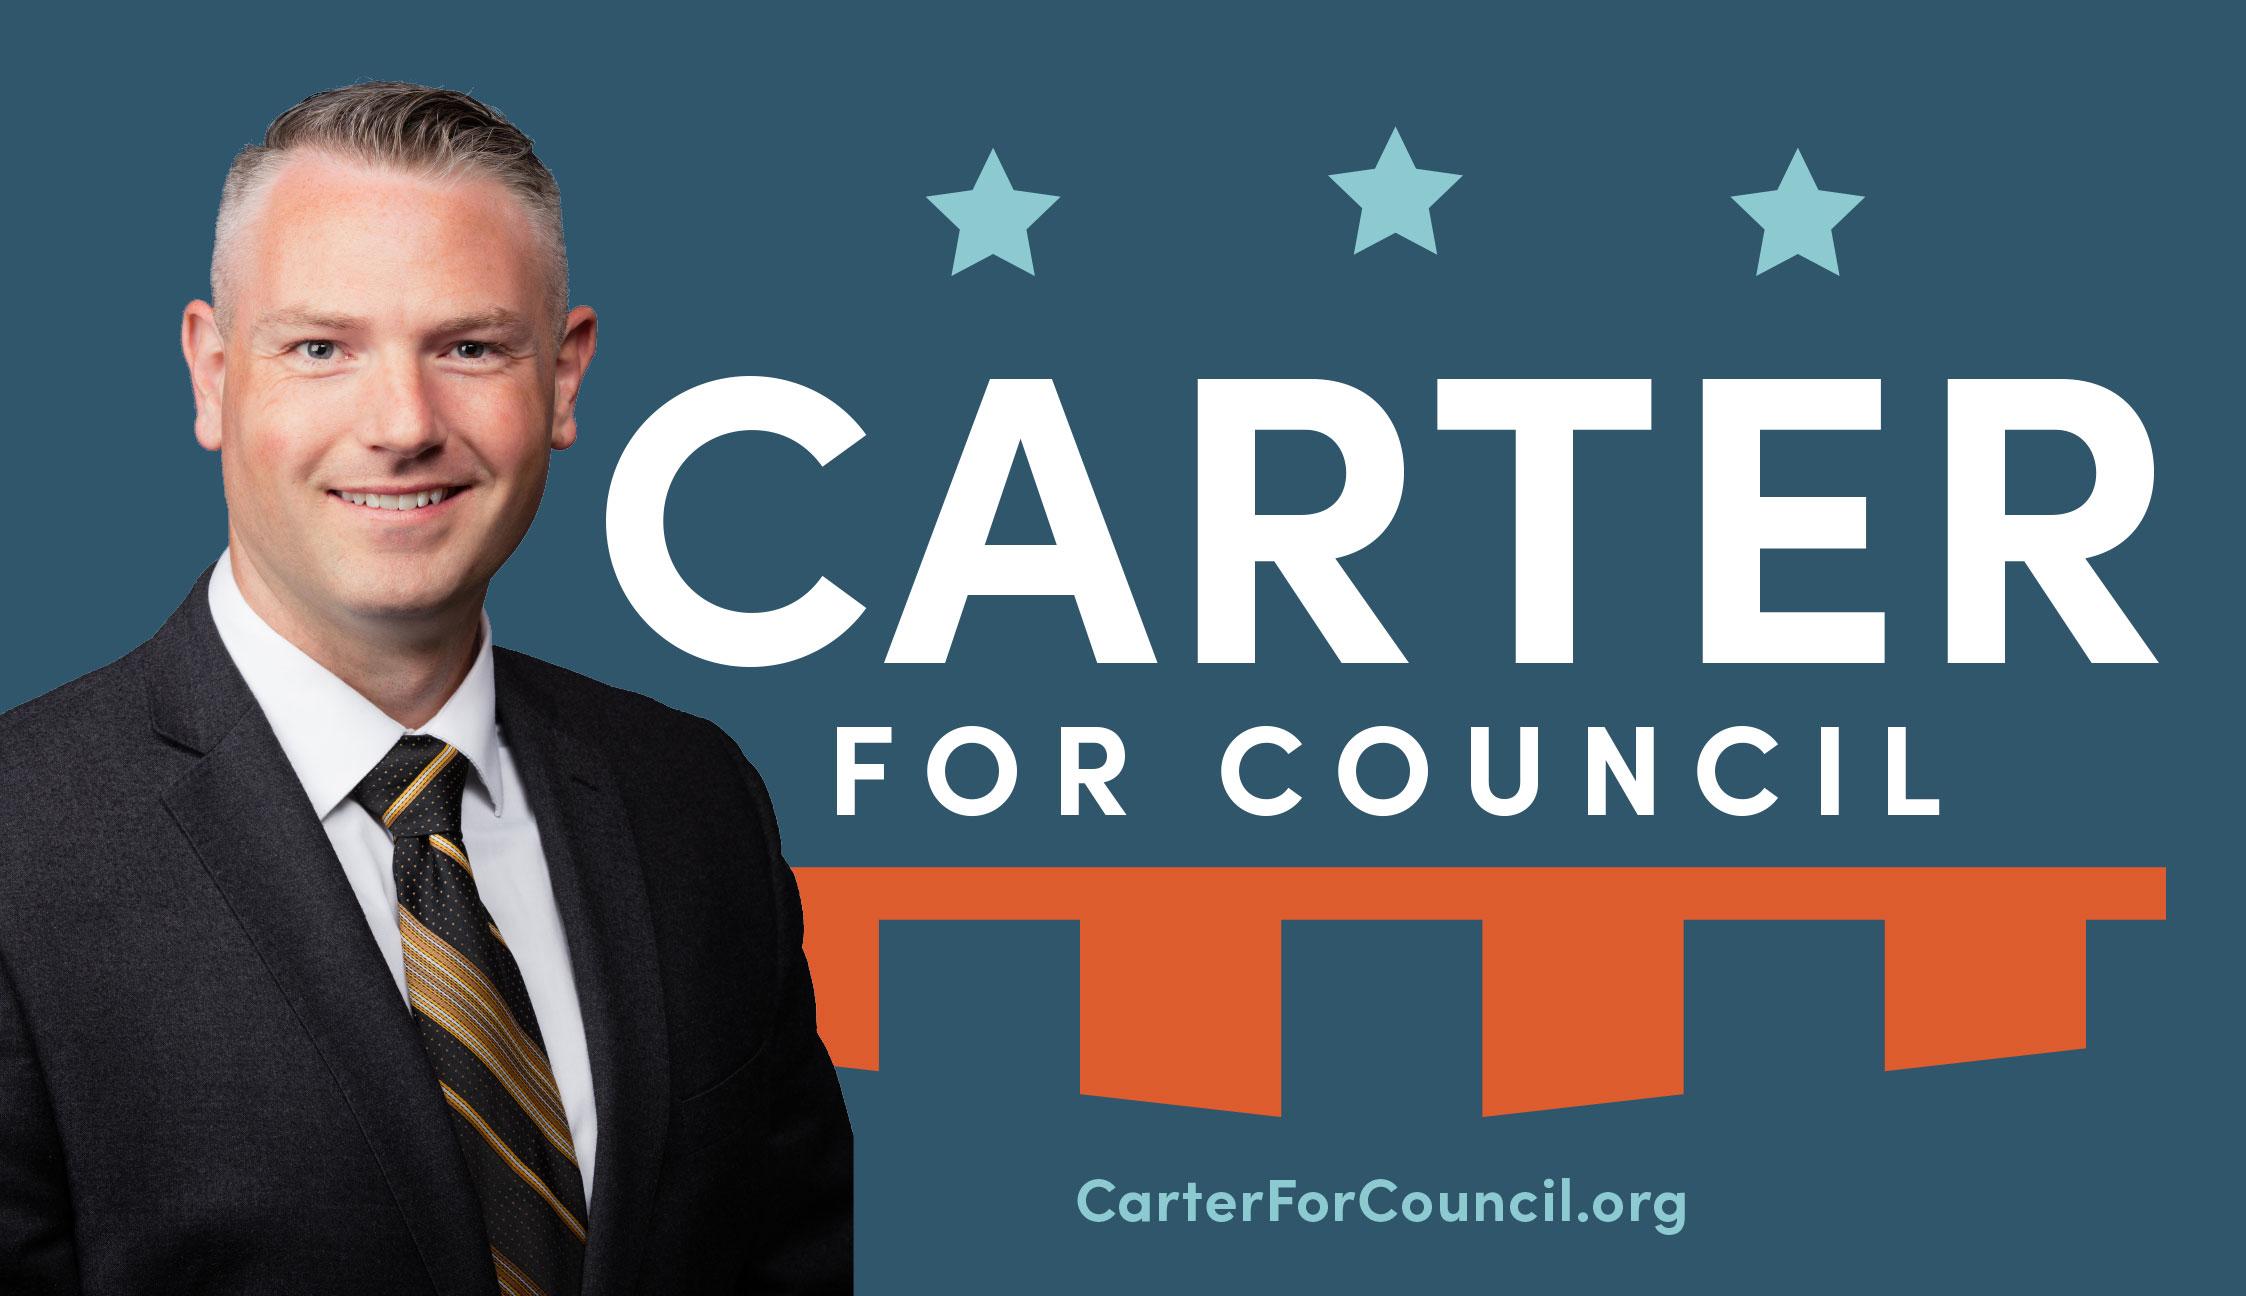 carter-for-council.jpg